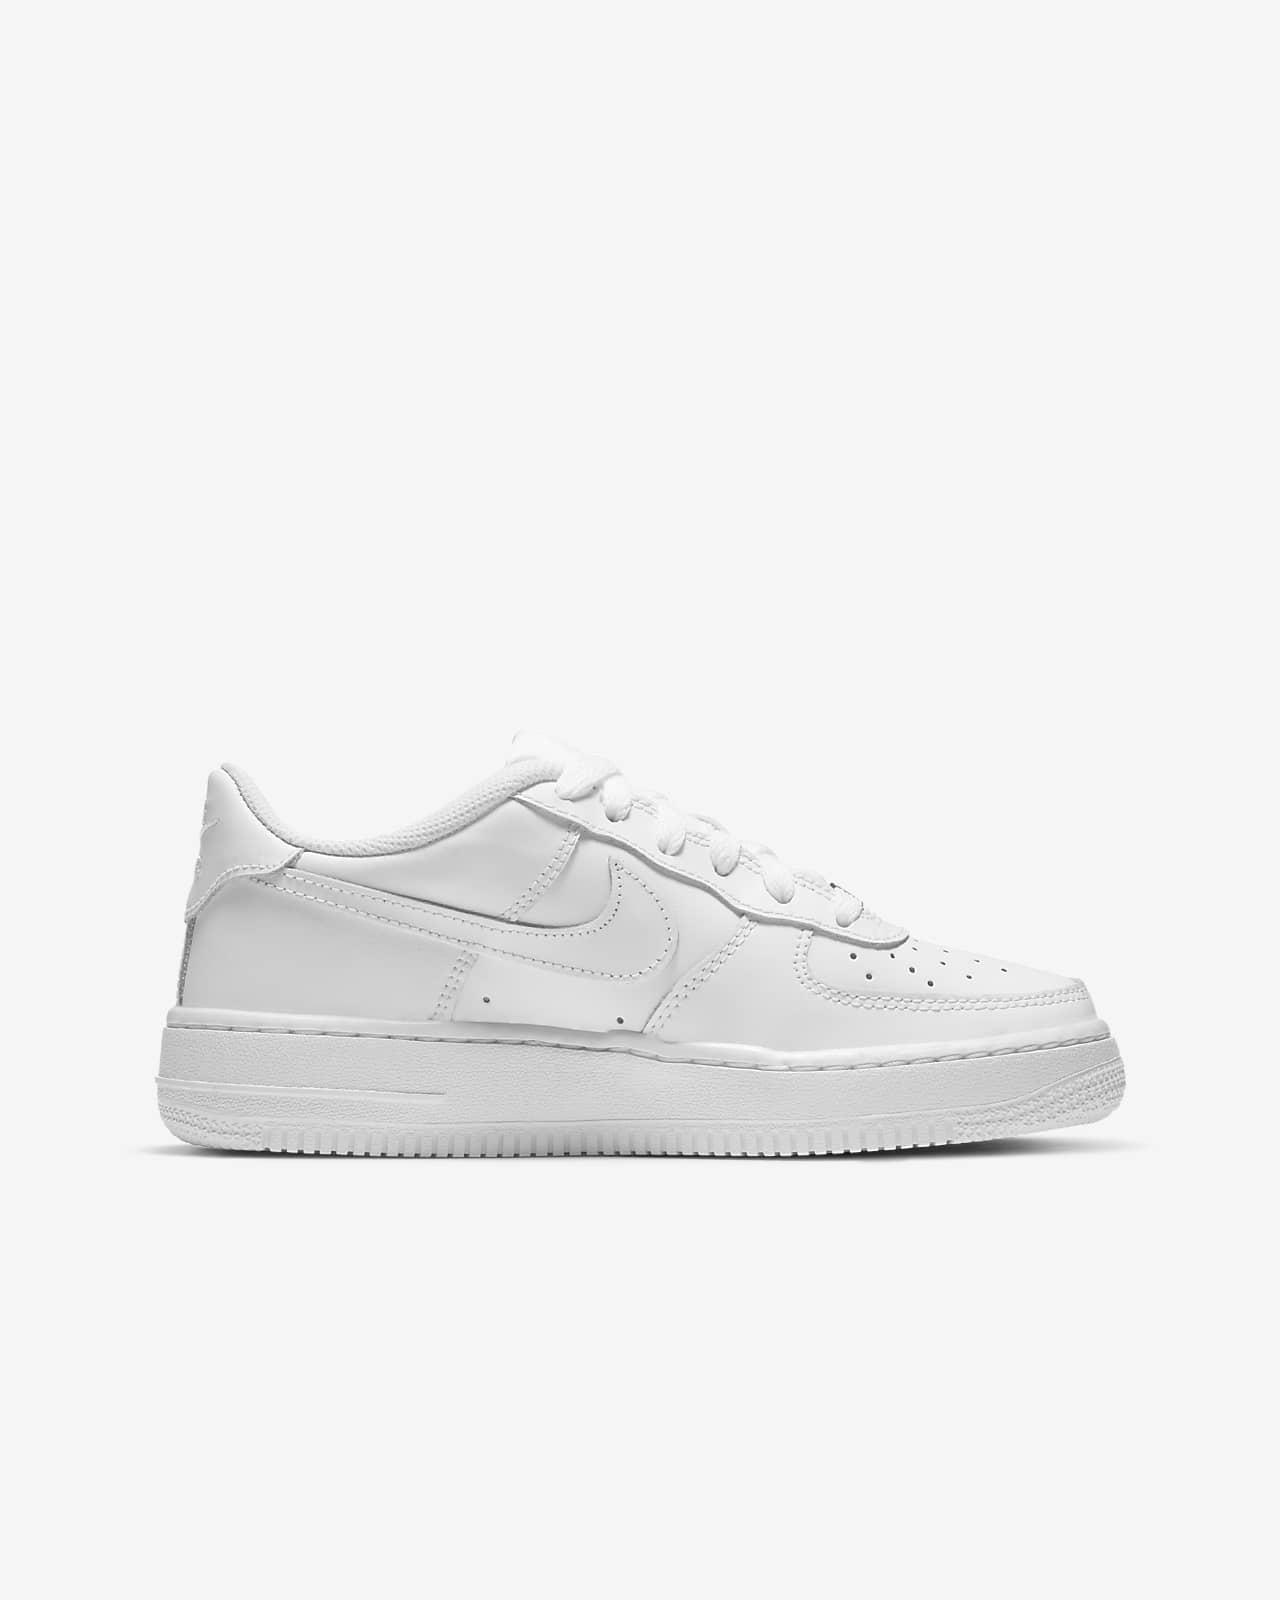 Nike Air Force 1 Schuh für ältere